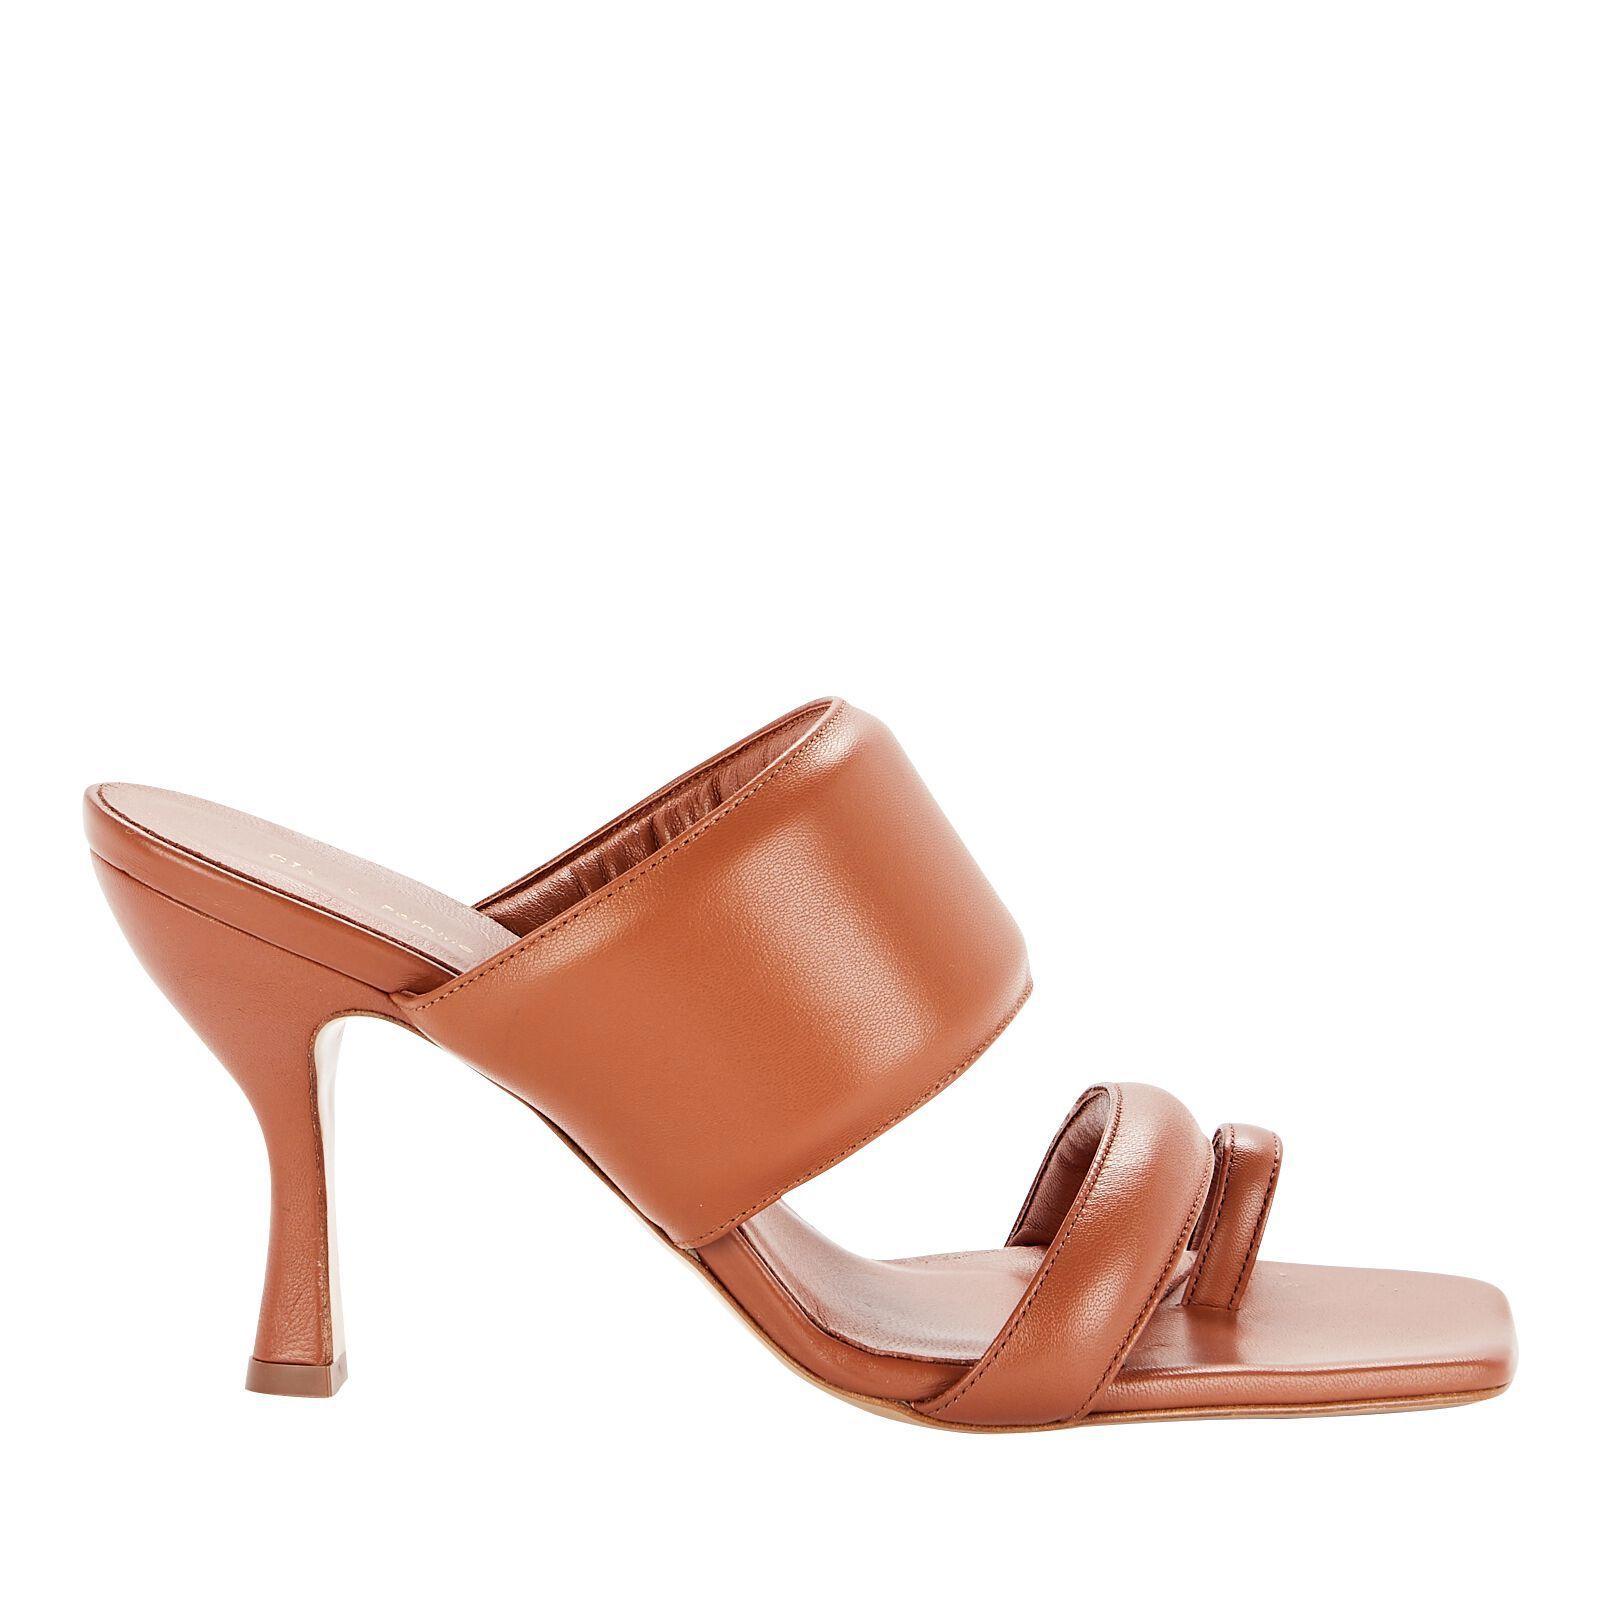 Gia Couture x Pernille Teisbaek Puffer Slide Sandals